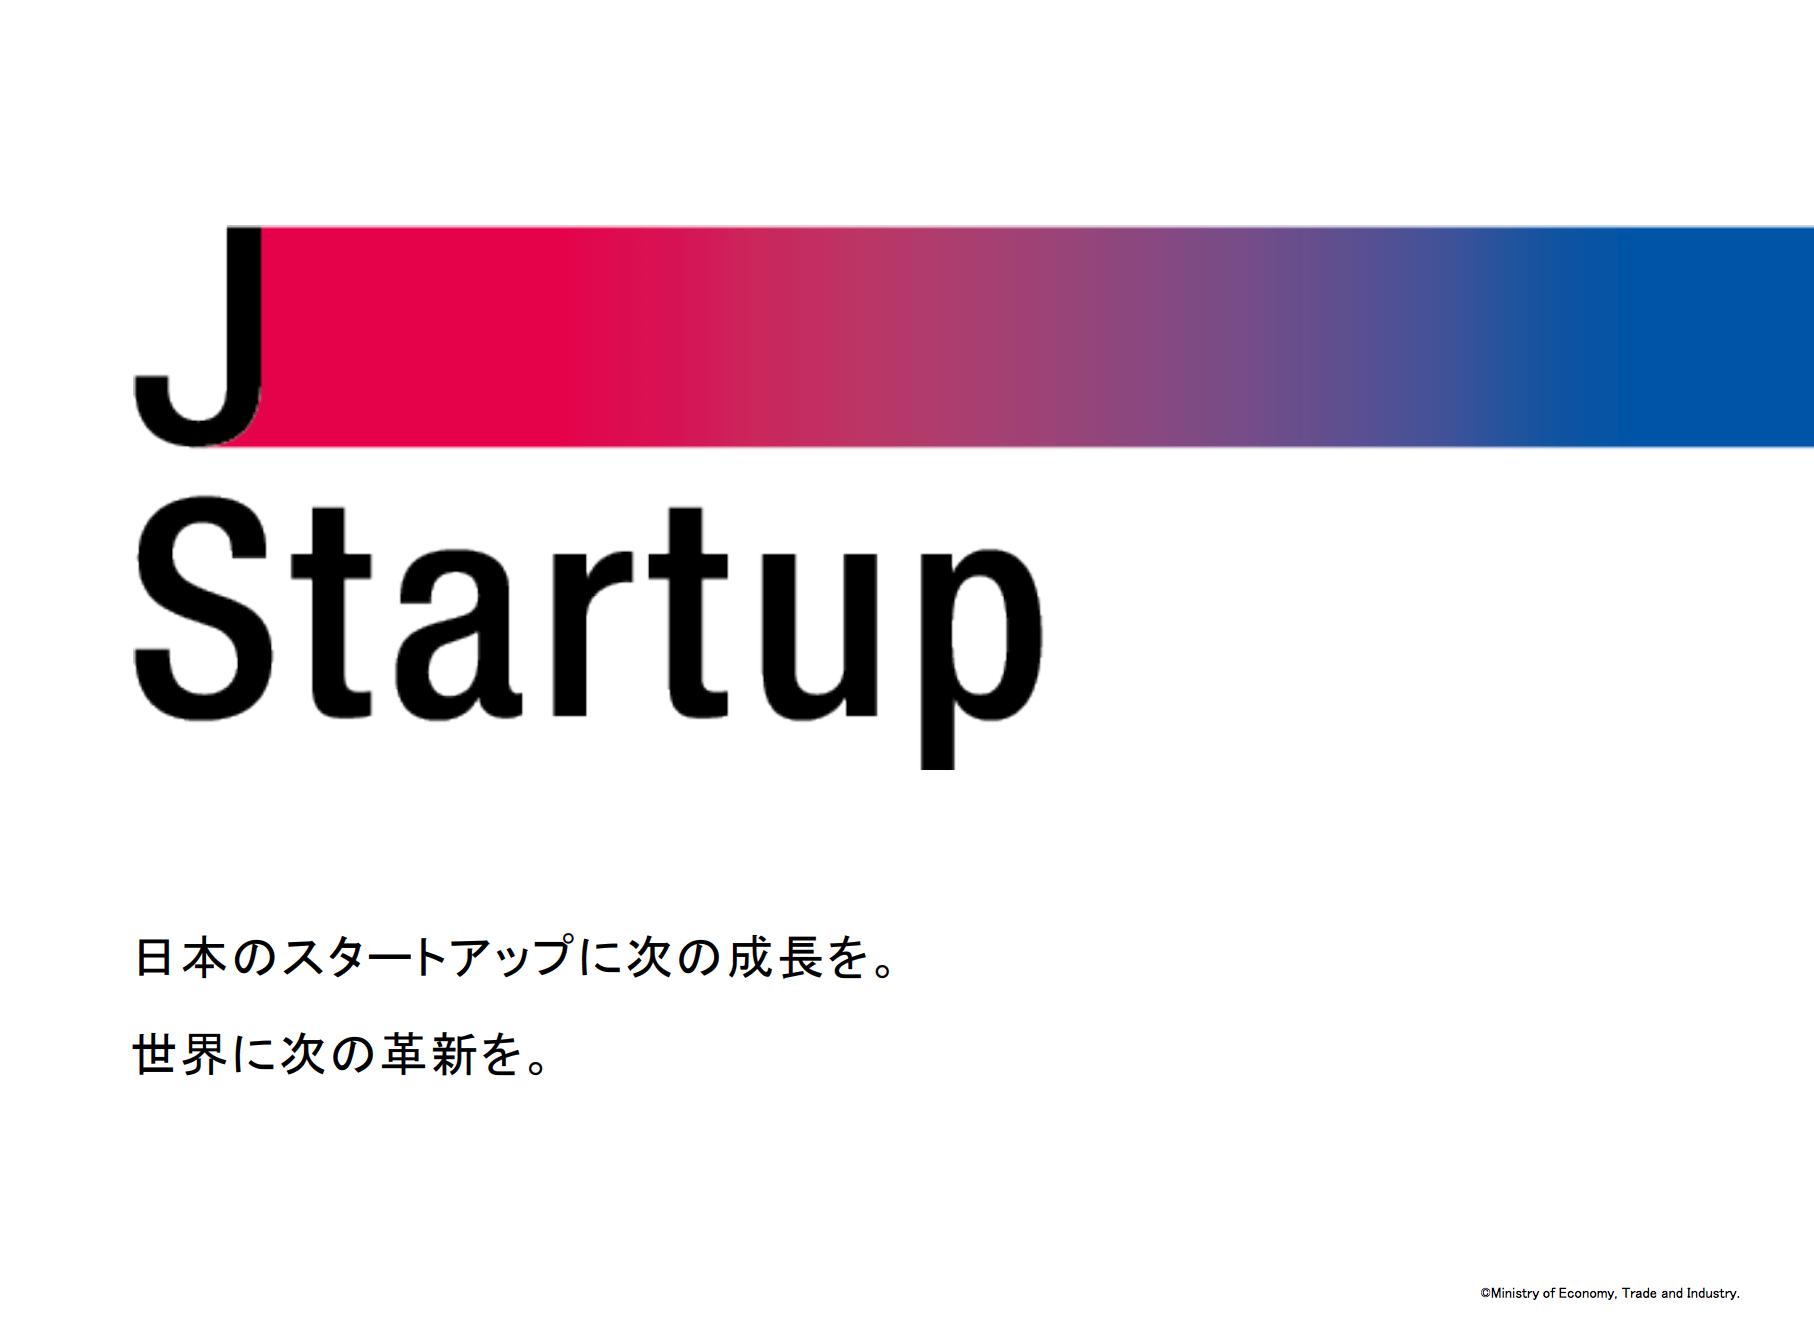 J-Startup企業一覧(経産省肝いりのスタートアップ支援プログラム)